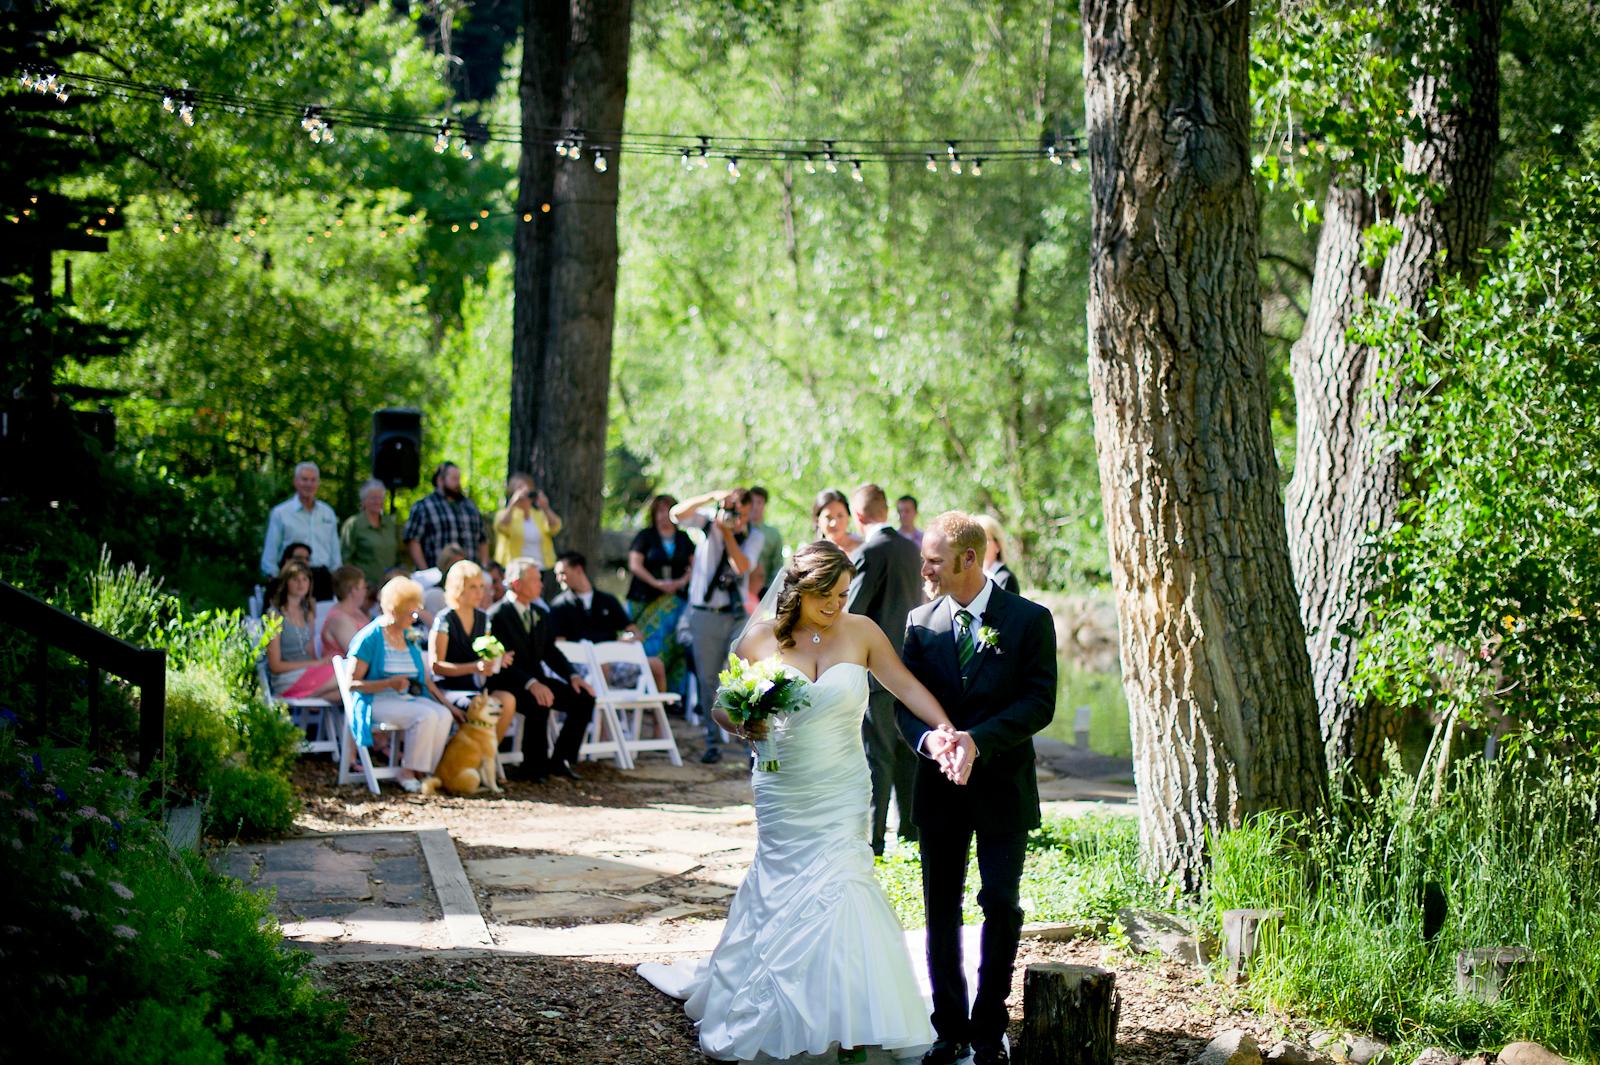 Boulder Wedding :: Heidi + Wayne are married along the ...